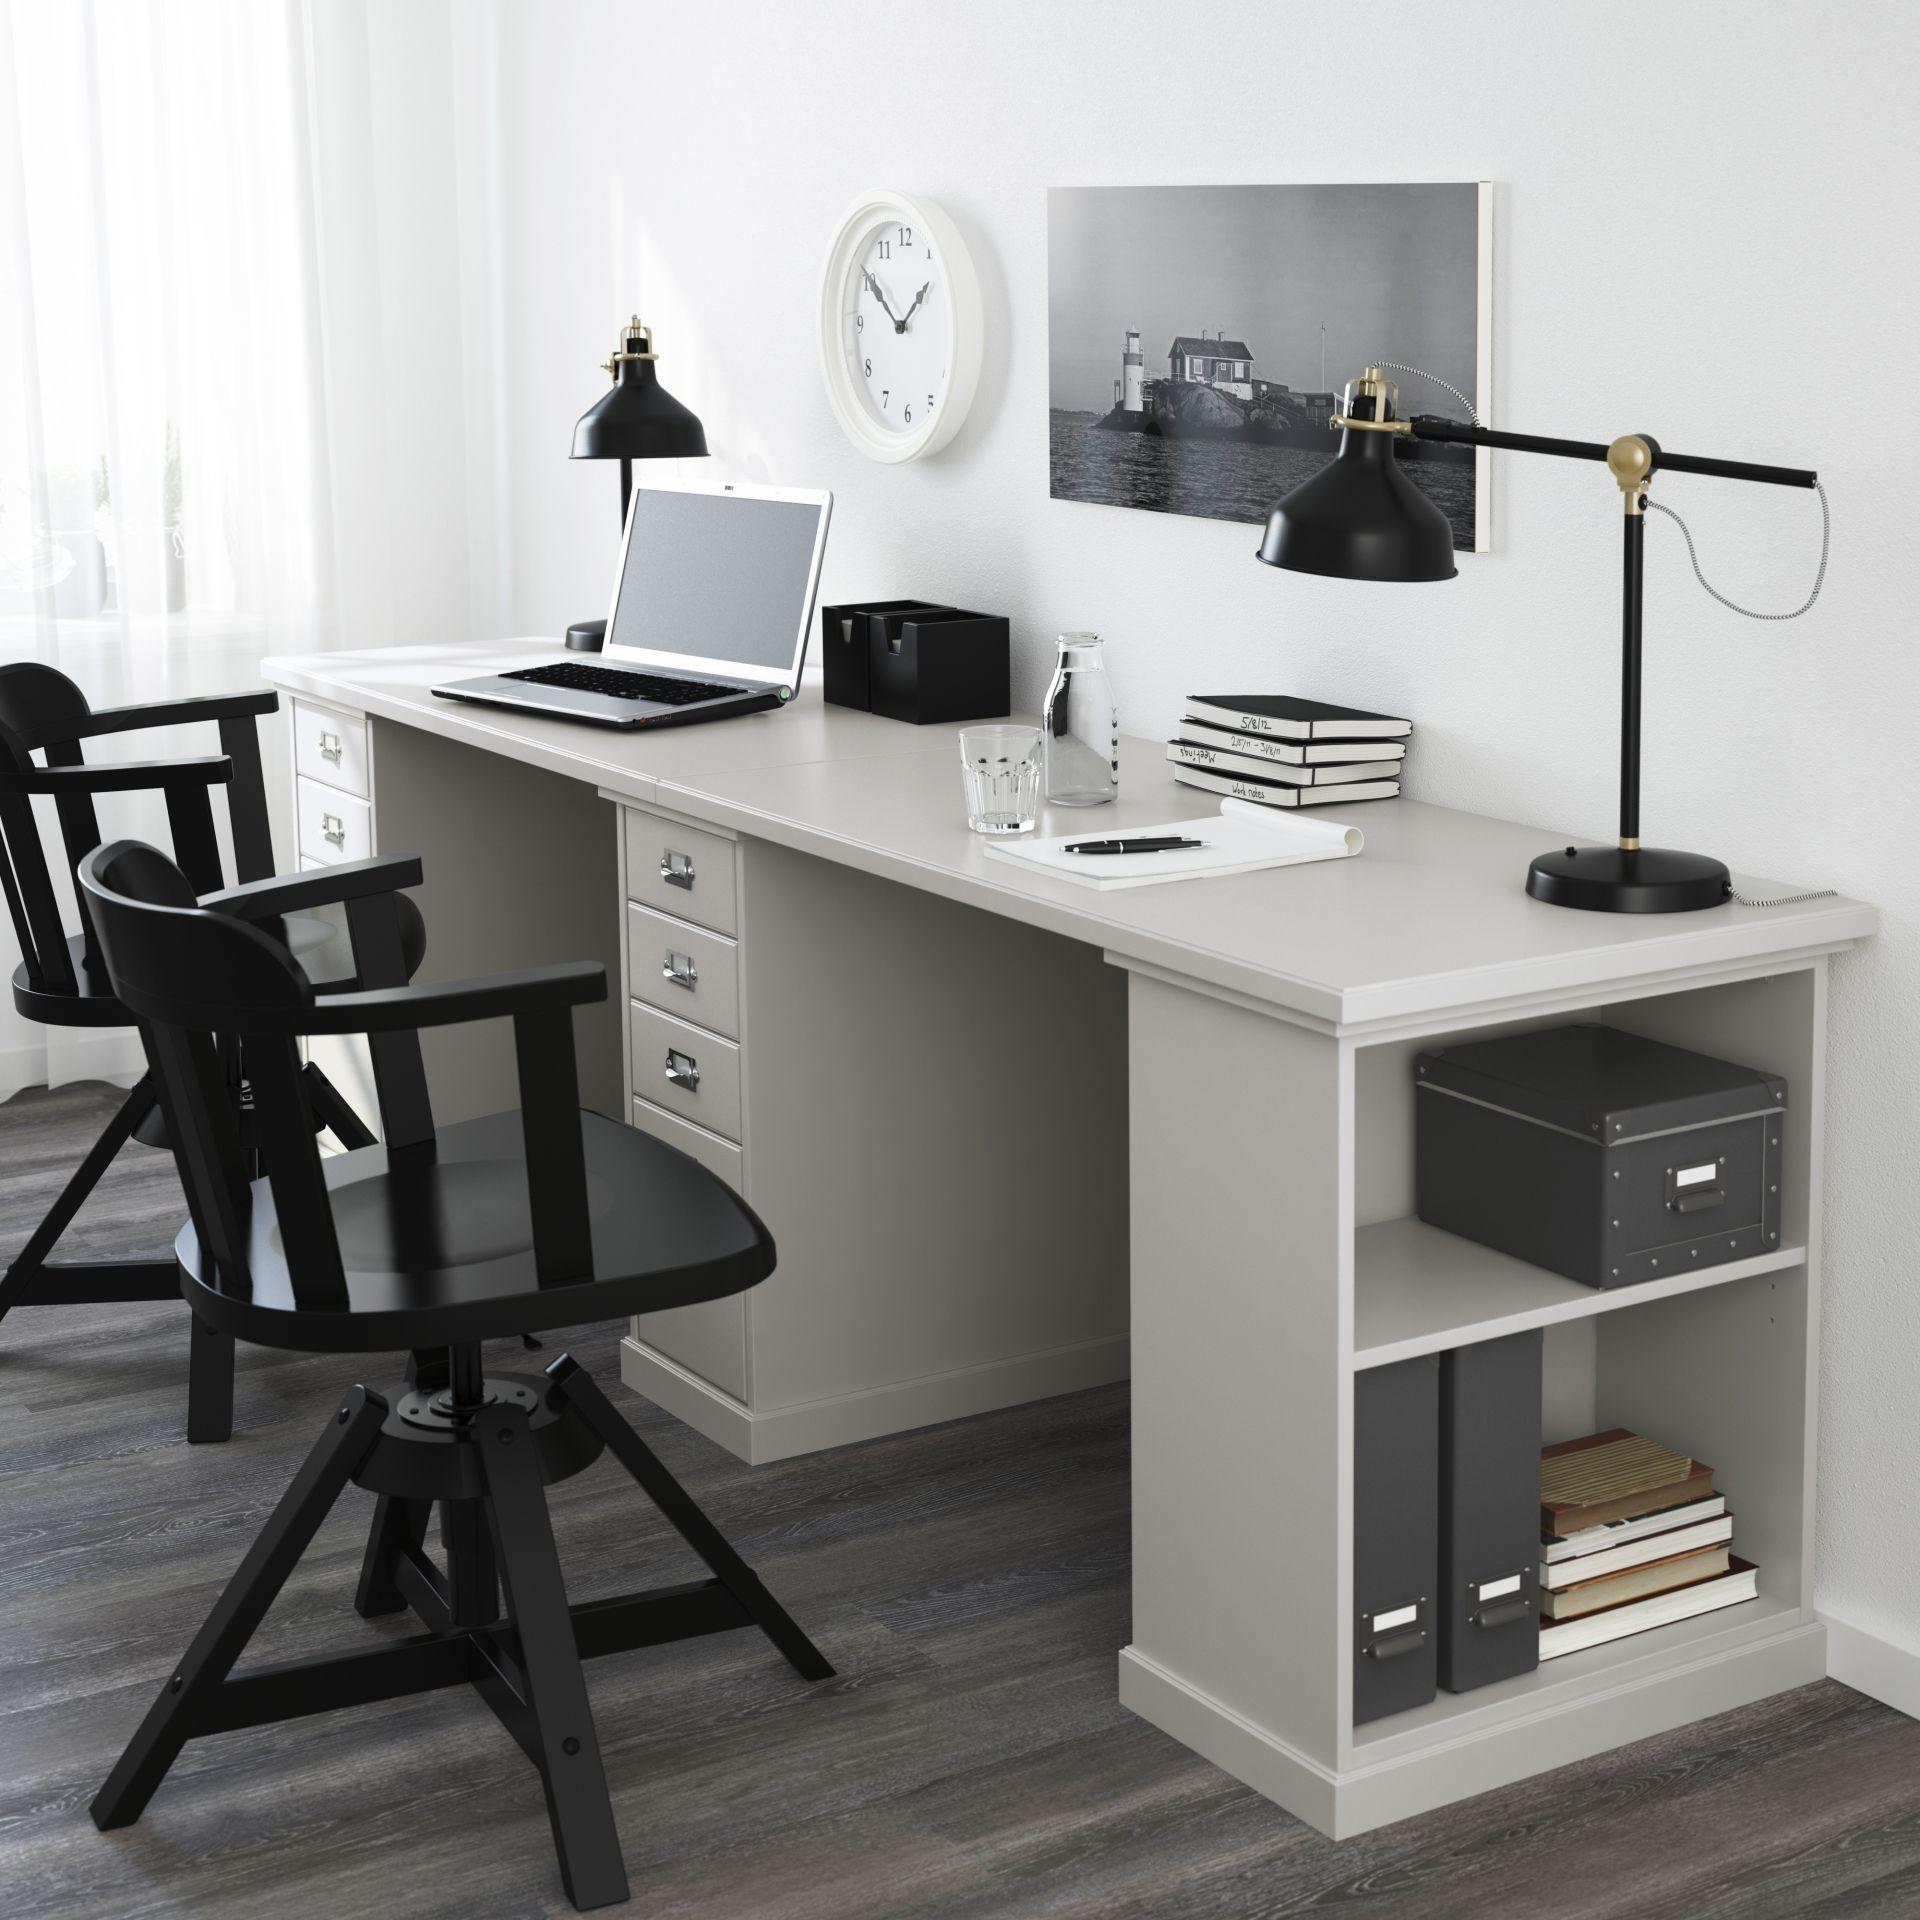 klimpen tafel lichtgrijs grijs studeren werkkamer en bureaus. Black Bedroom Furniture Sets. Home Design Ideas